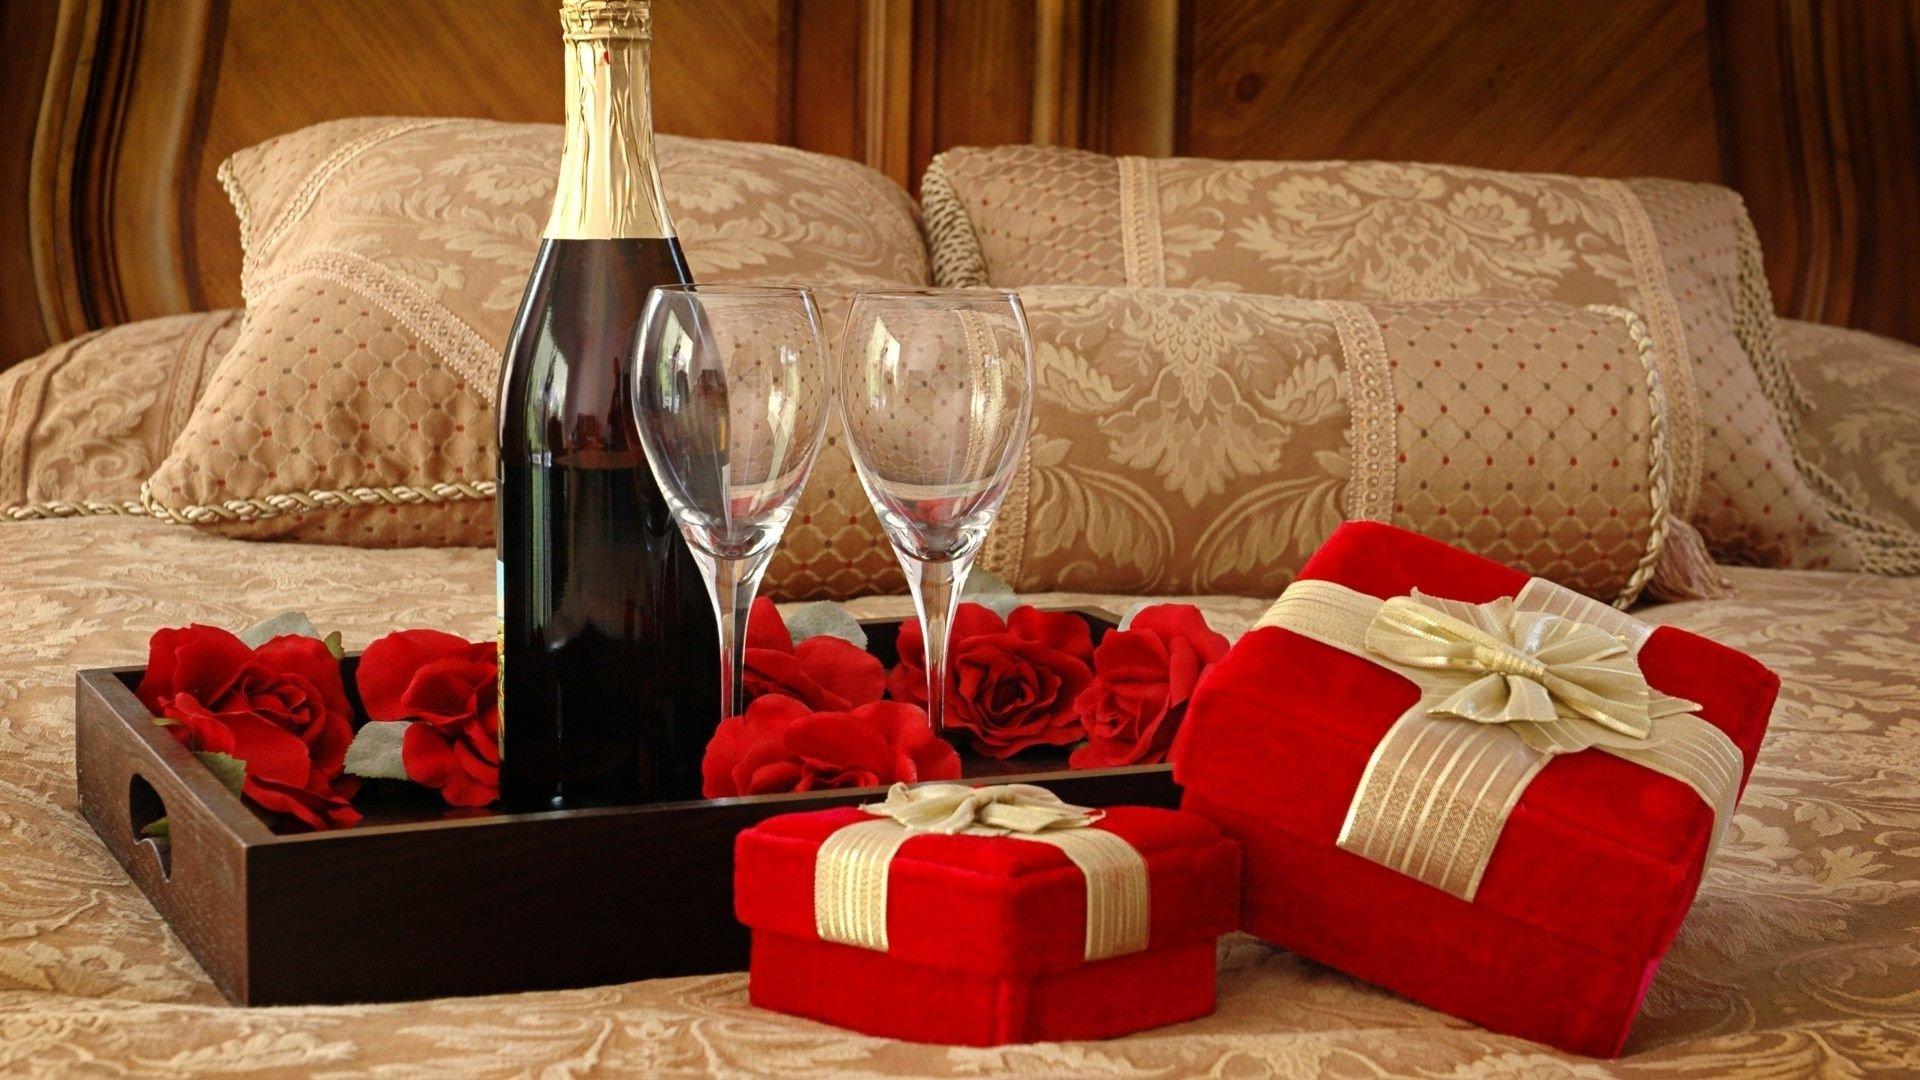 10 Pretty Romantic Birthday Ideas For Boyfriend romantic birthday ideas for boyfriend prom dresses and beauty 2